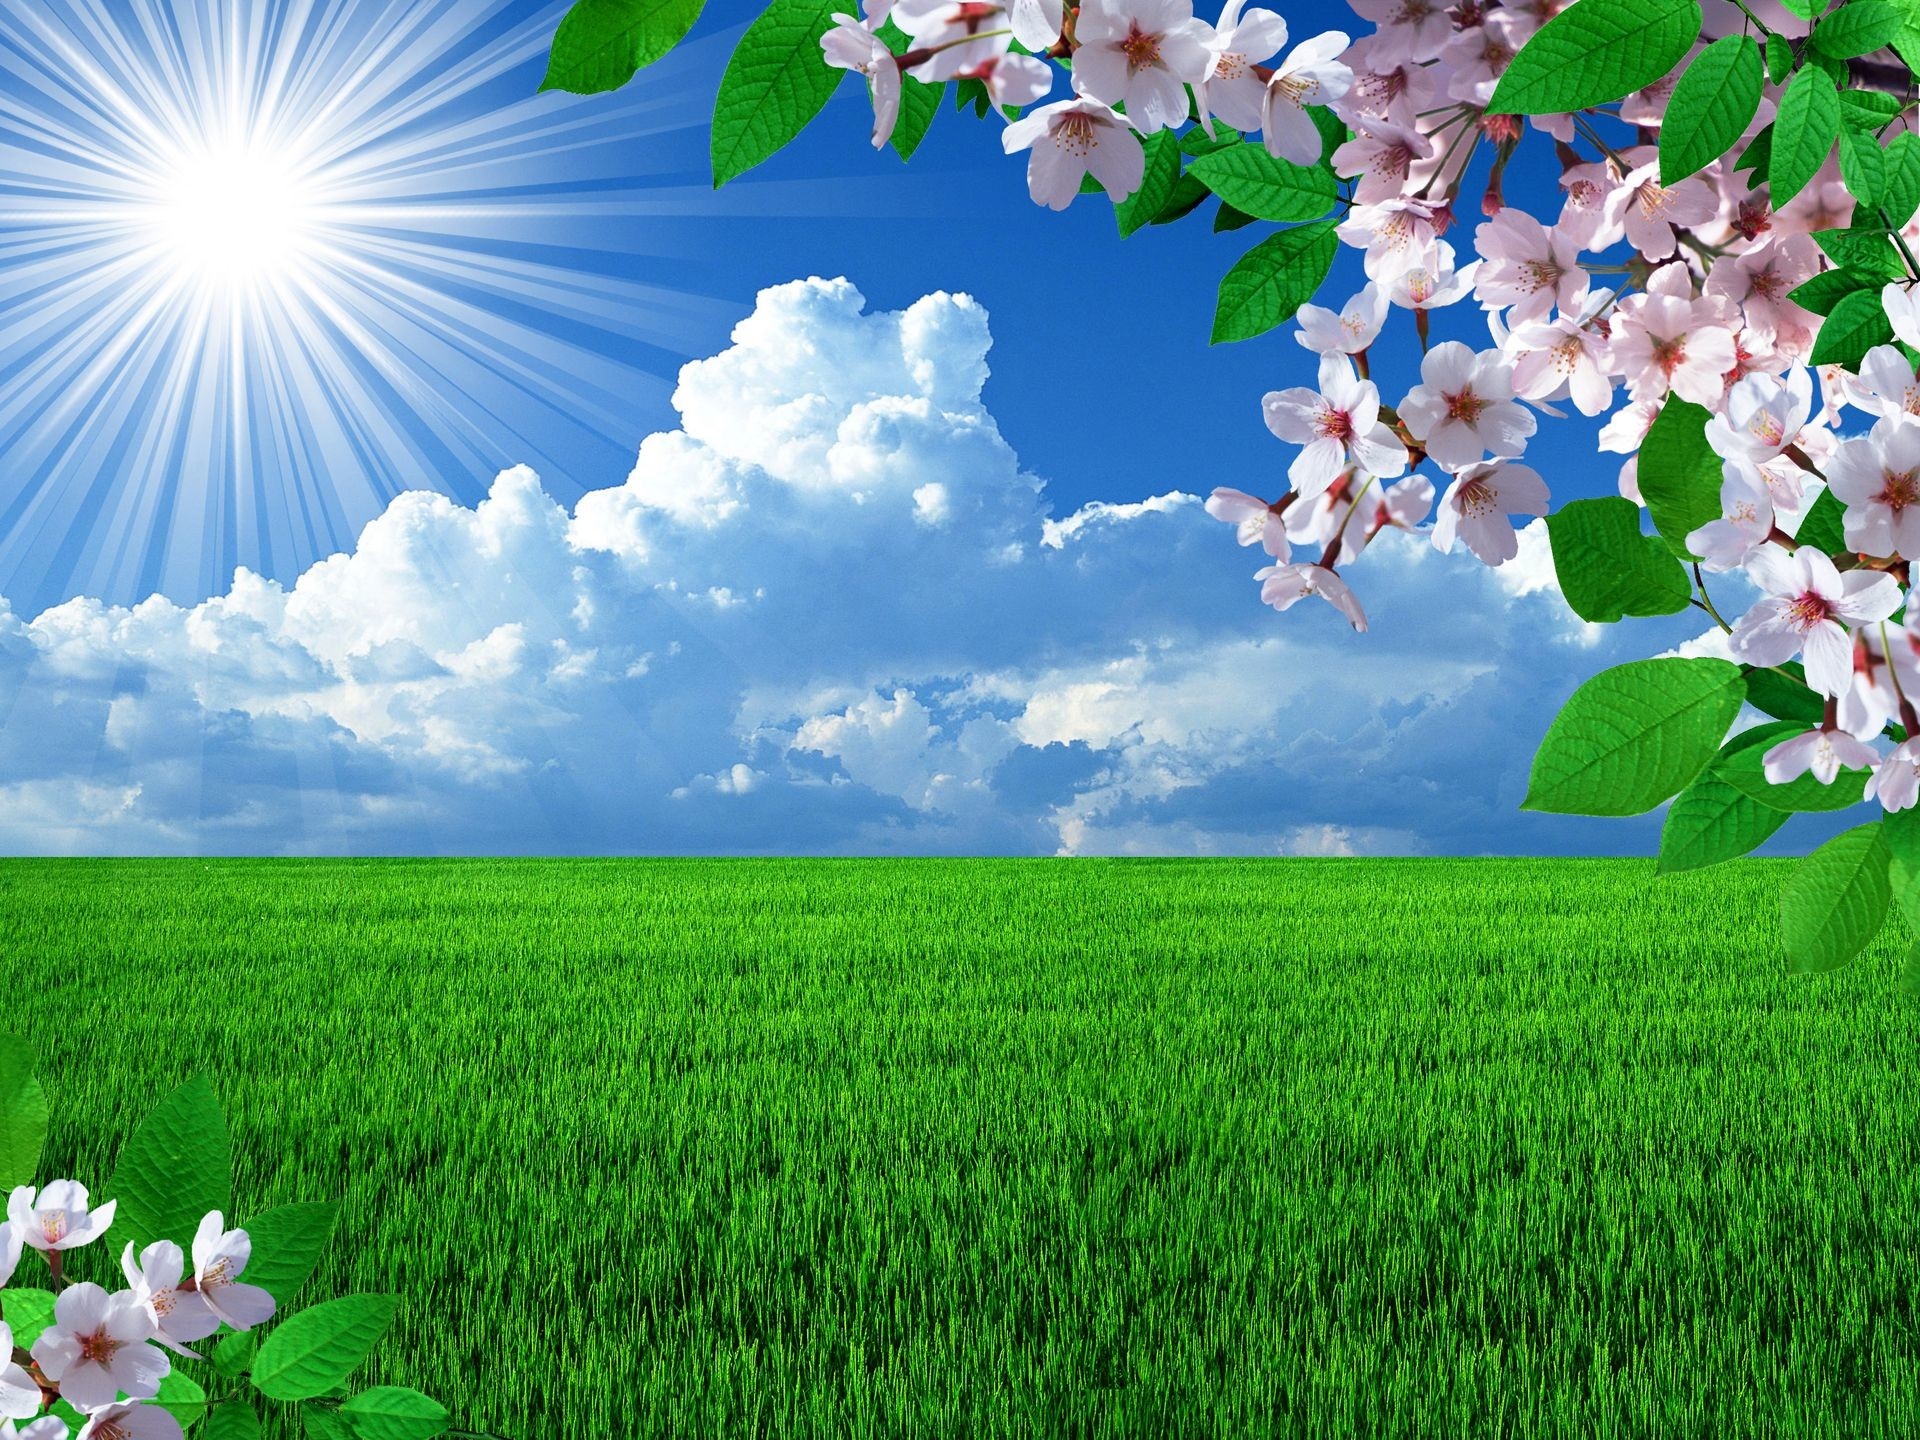 83 Springtime Desktop Wallpapers on WallpaperPlay 1920x1440